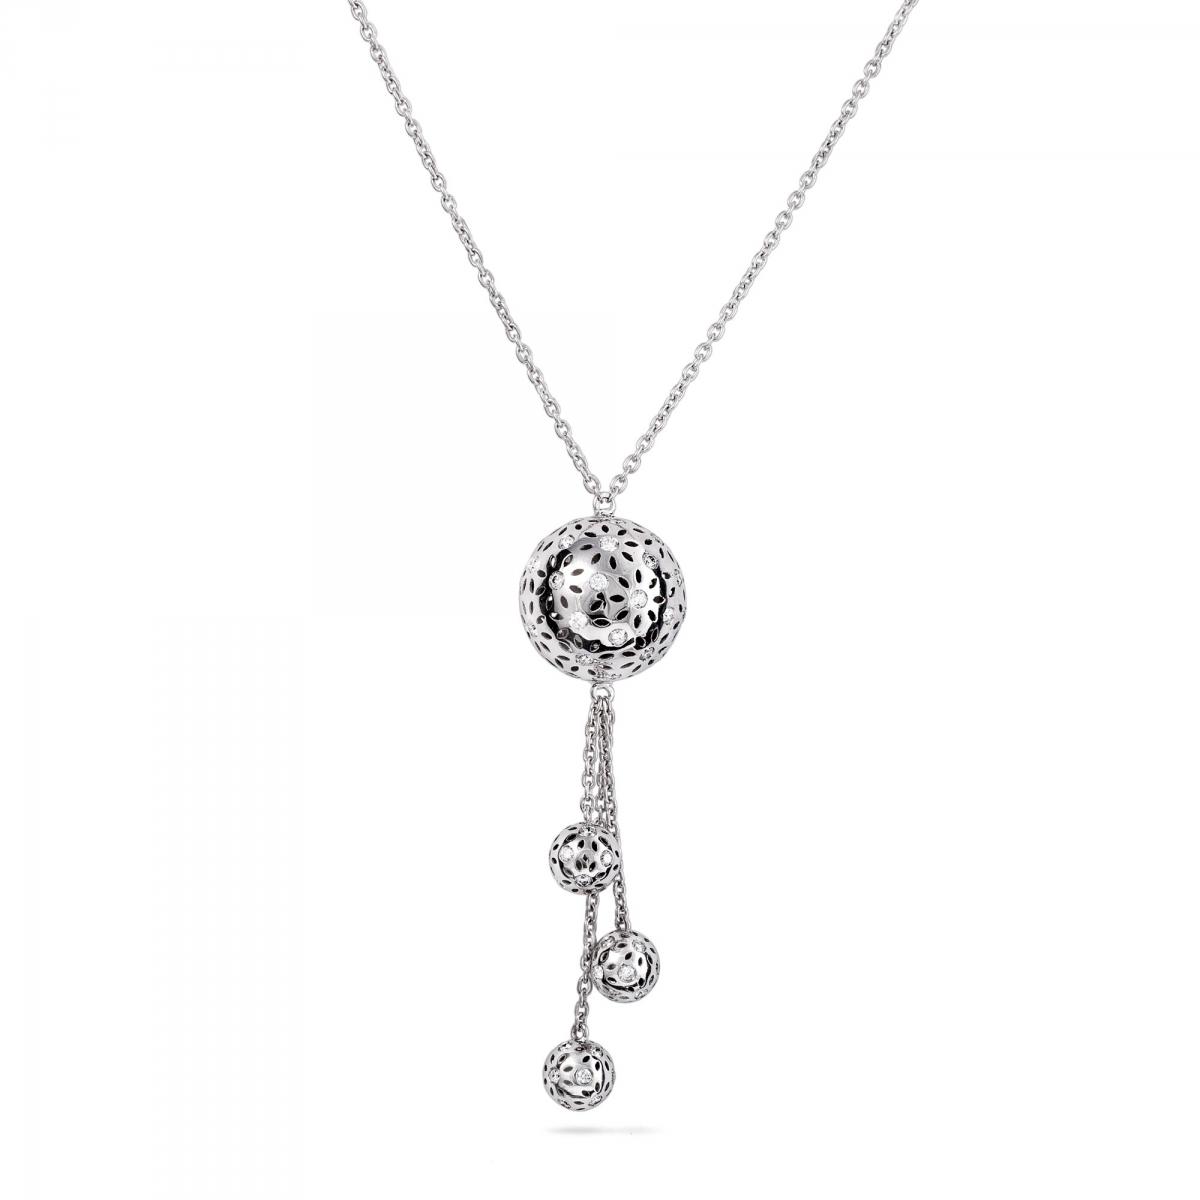 Necklace 3 pendant globes